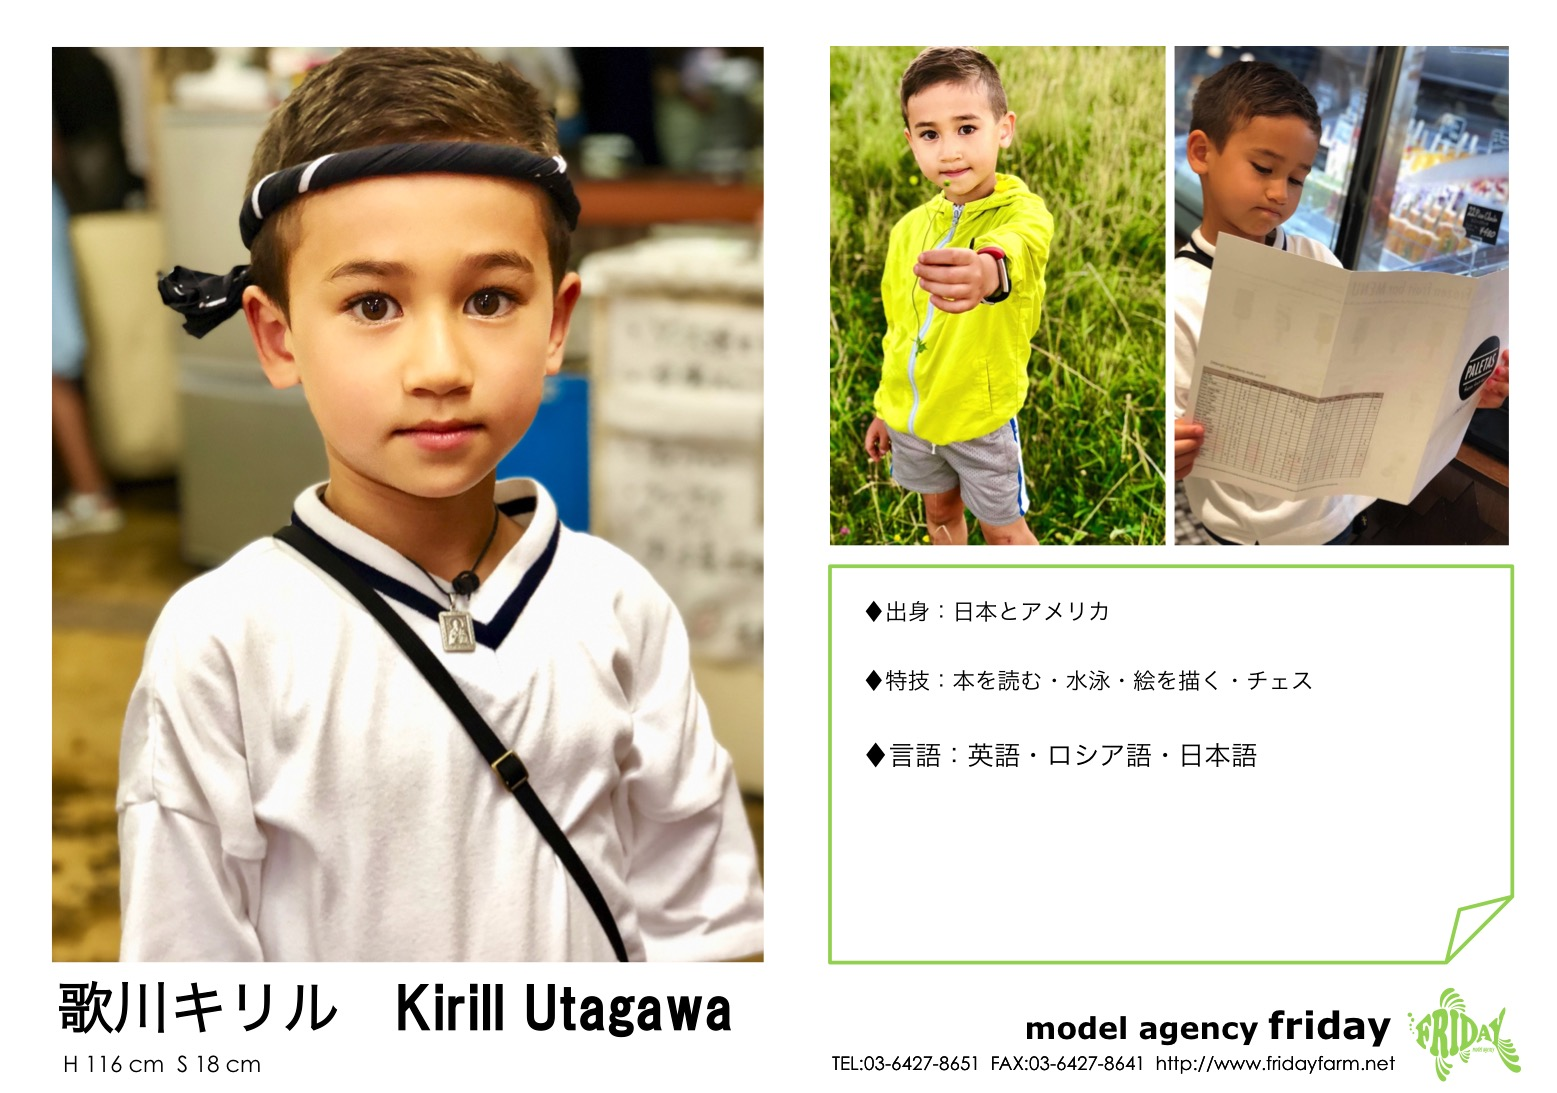 Kirill Utagawa - 歌川キリル | model agency friday